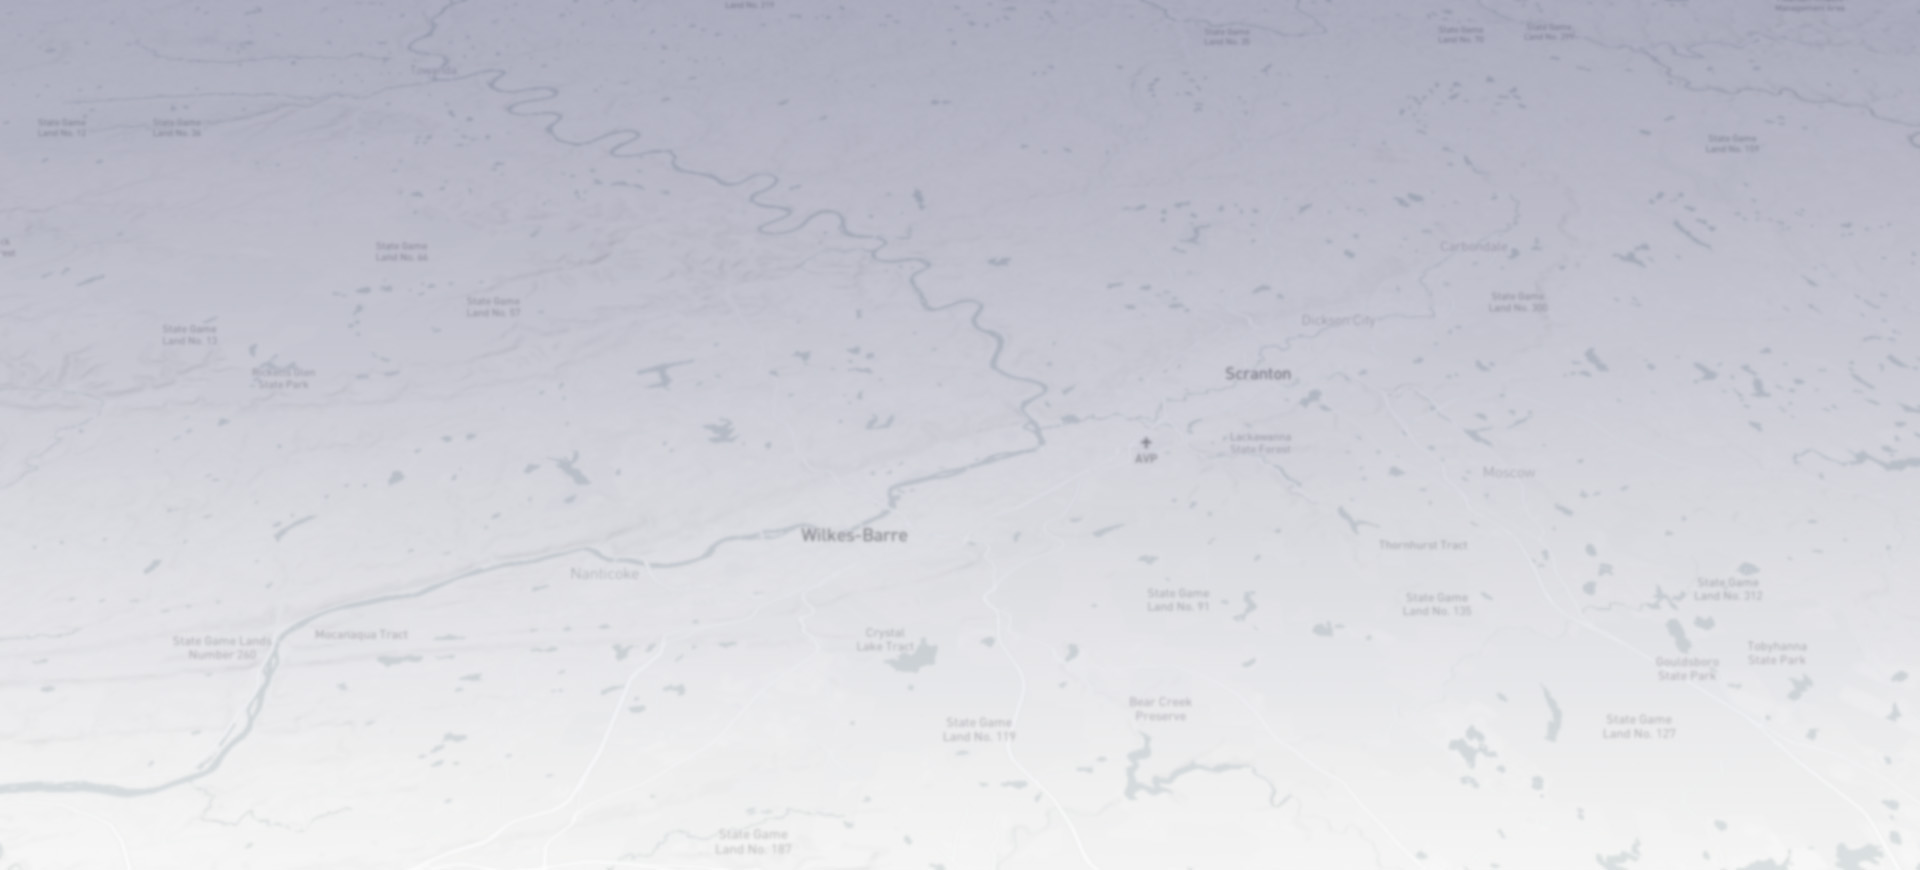 Leadership Wilkes-Barre Community Impact Map